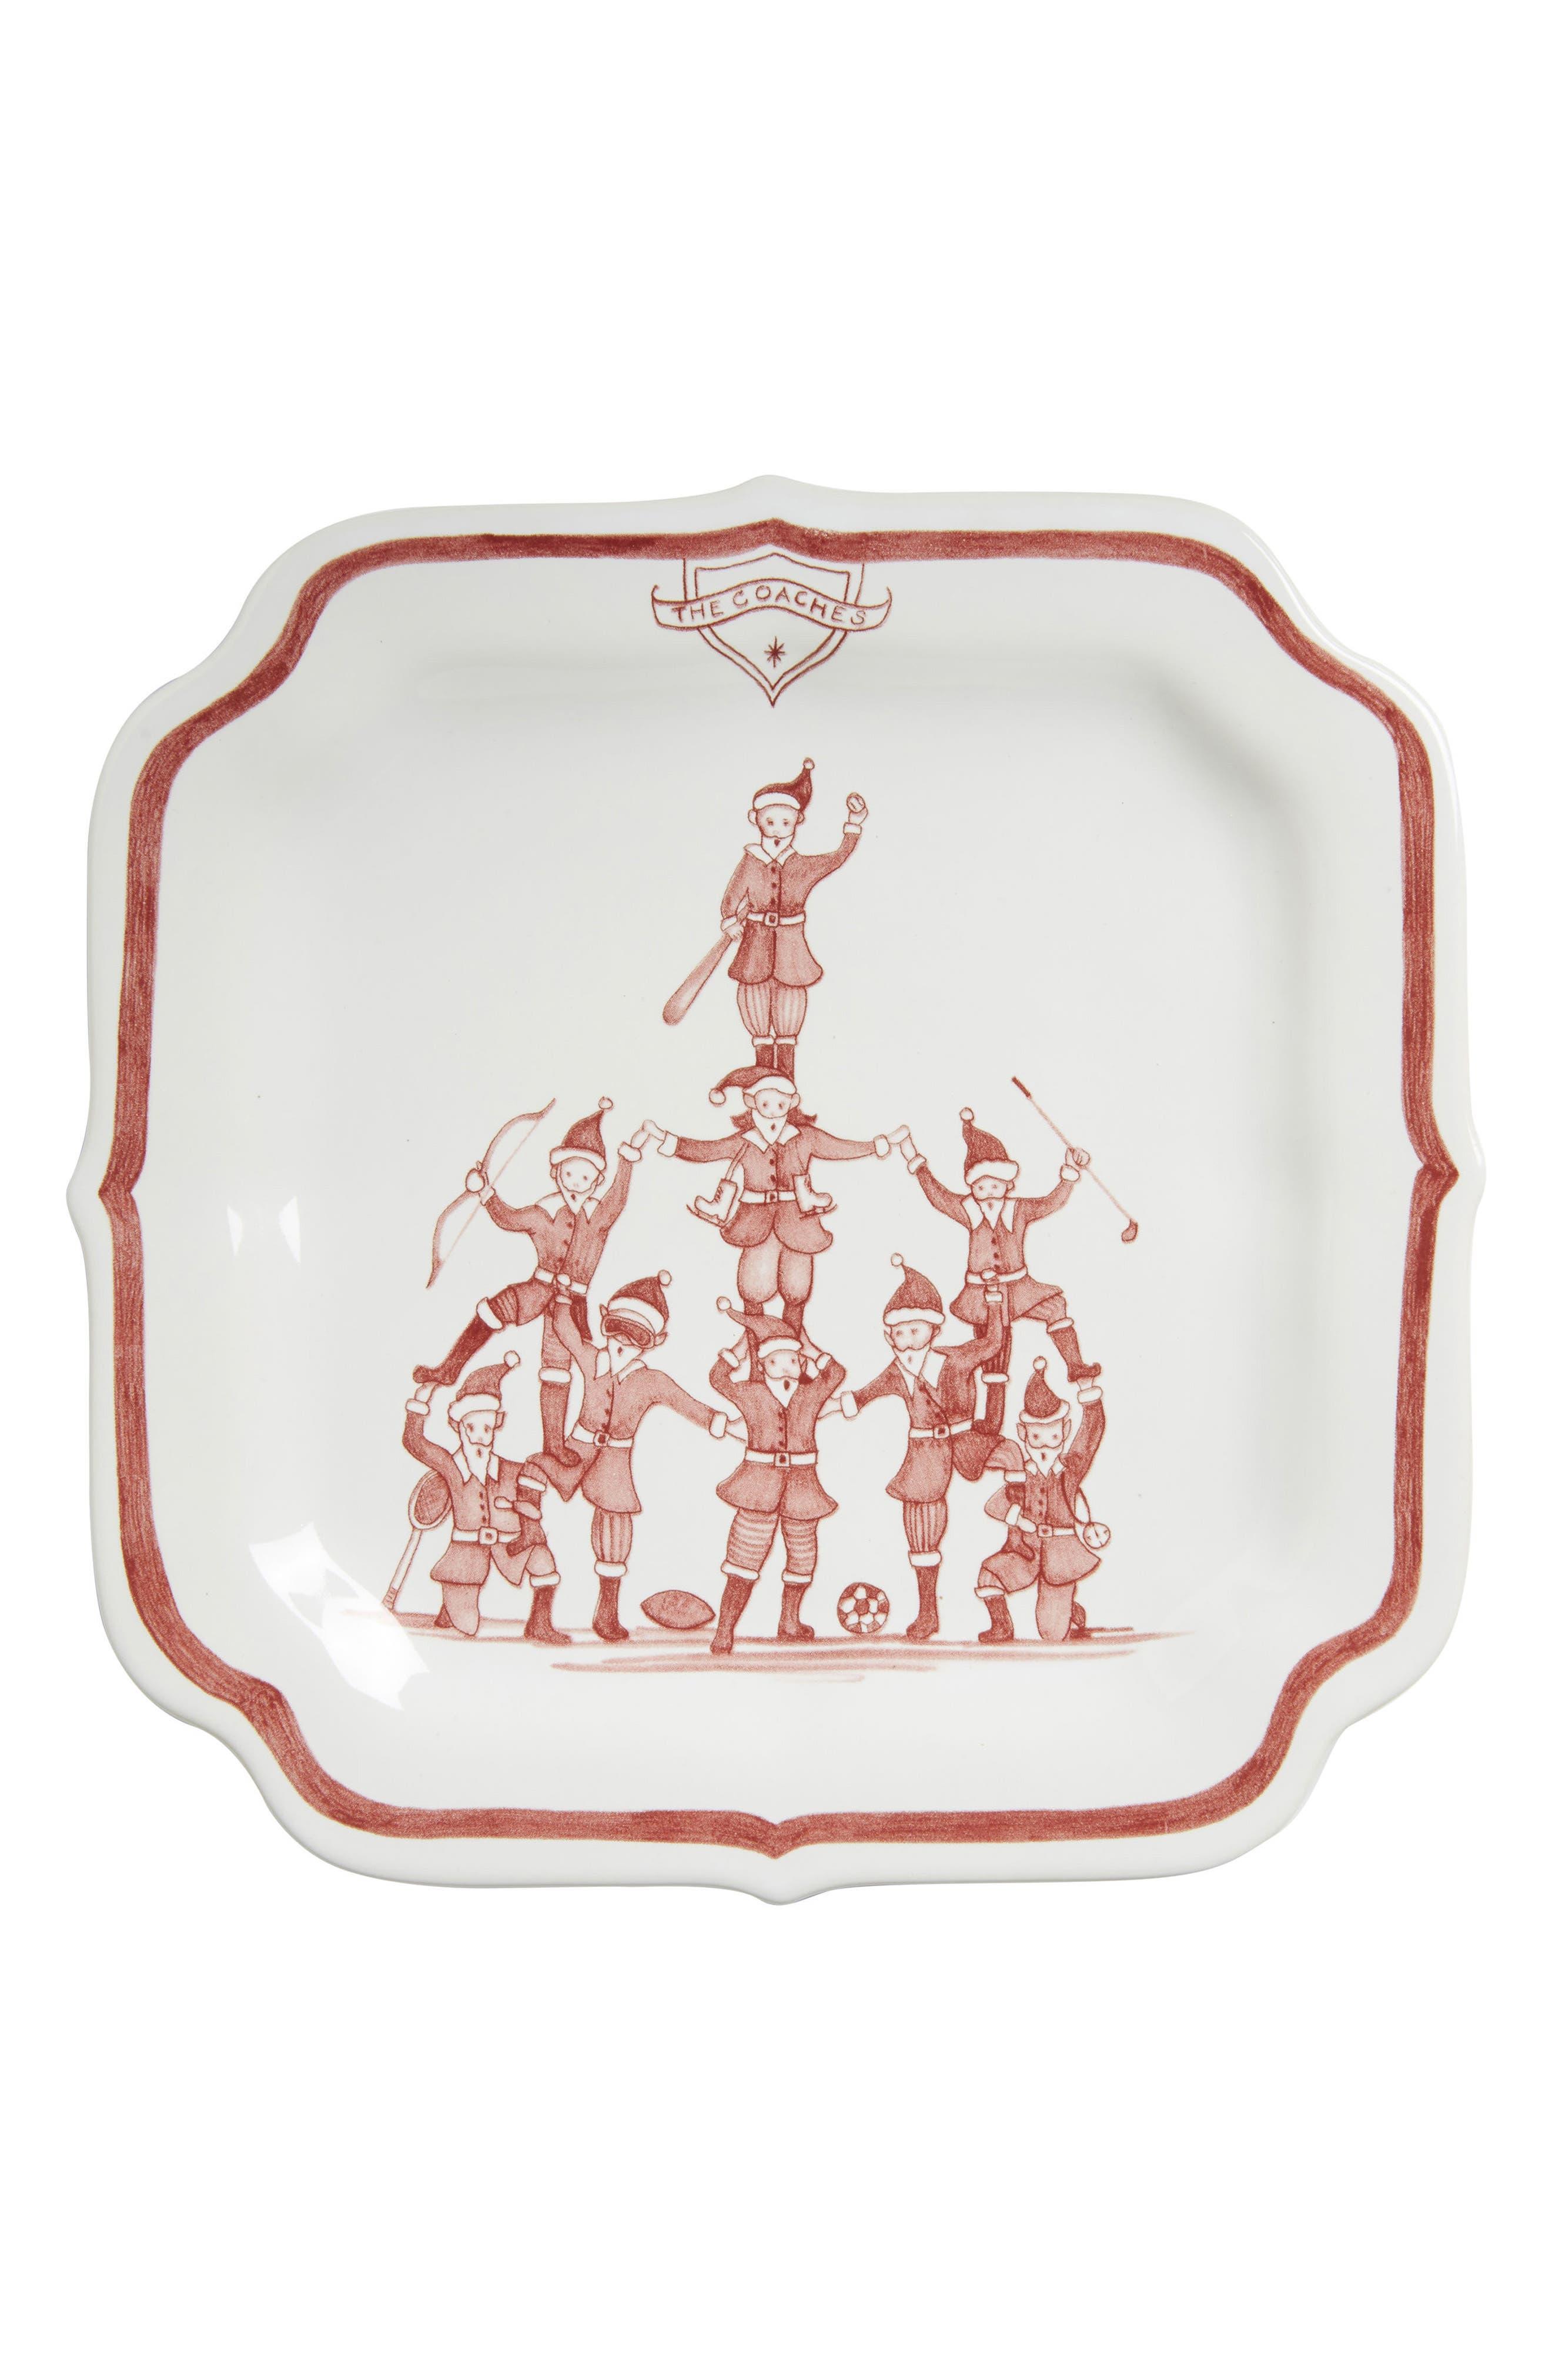 Juliska Reindeer Games Coaches Ceramic Plate